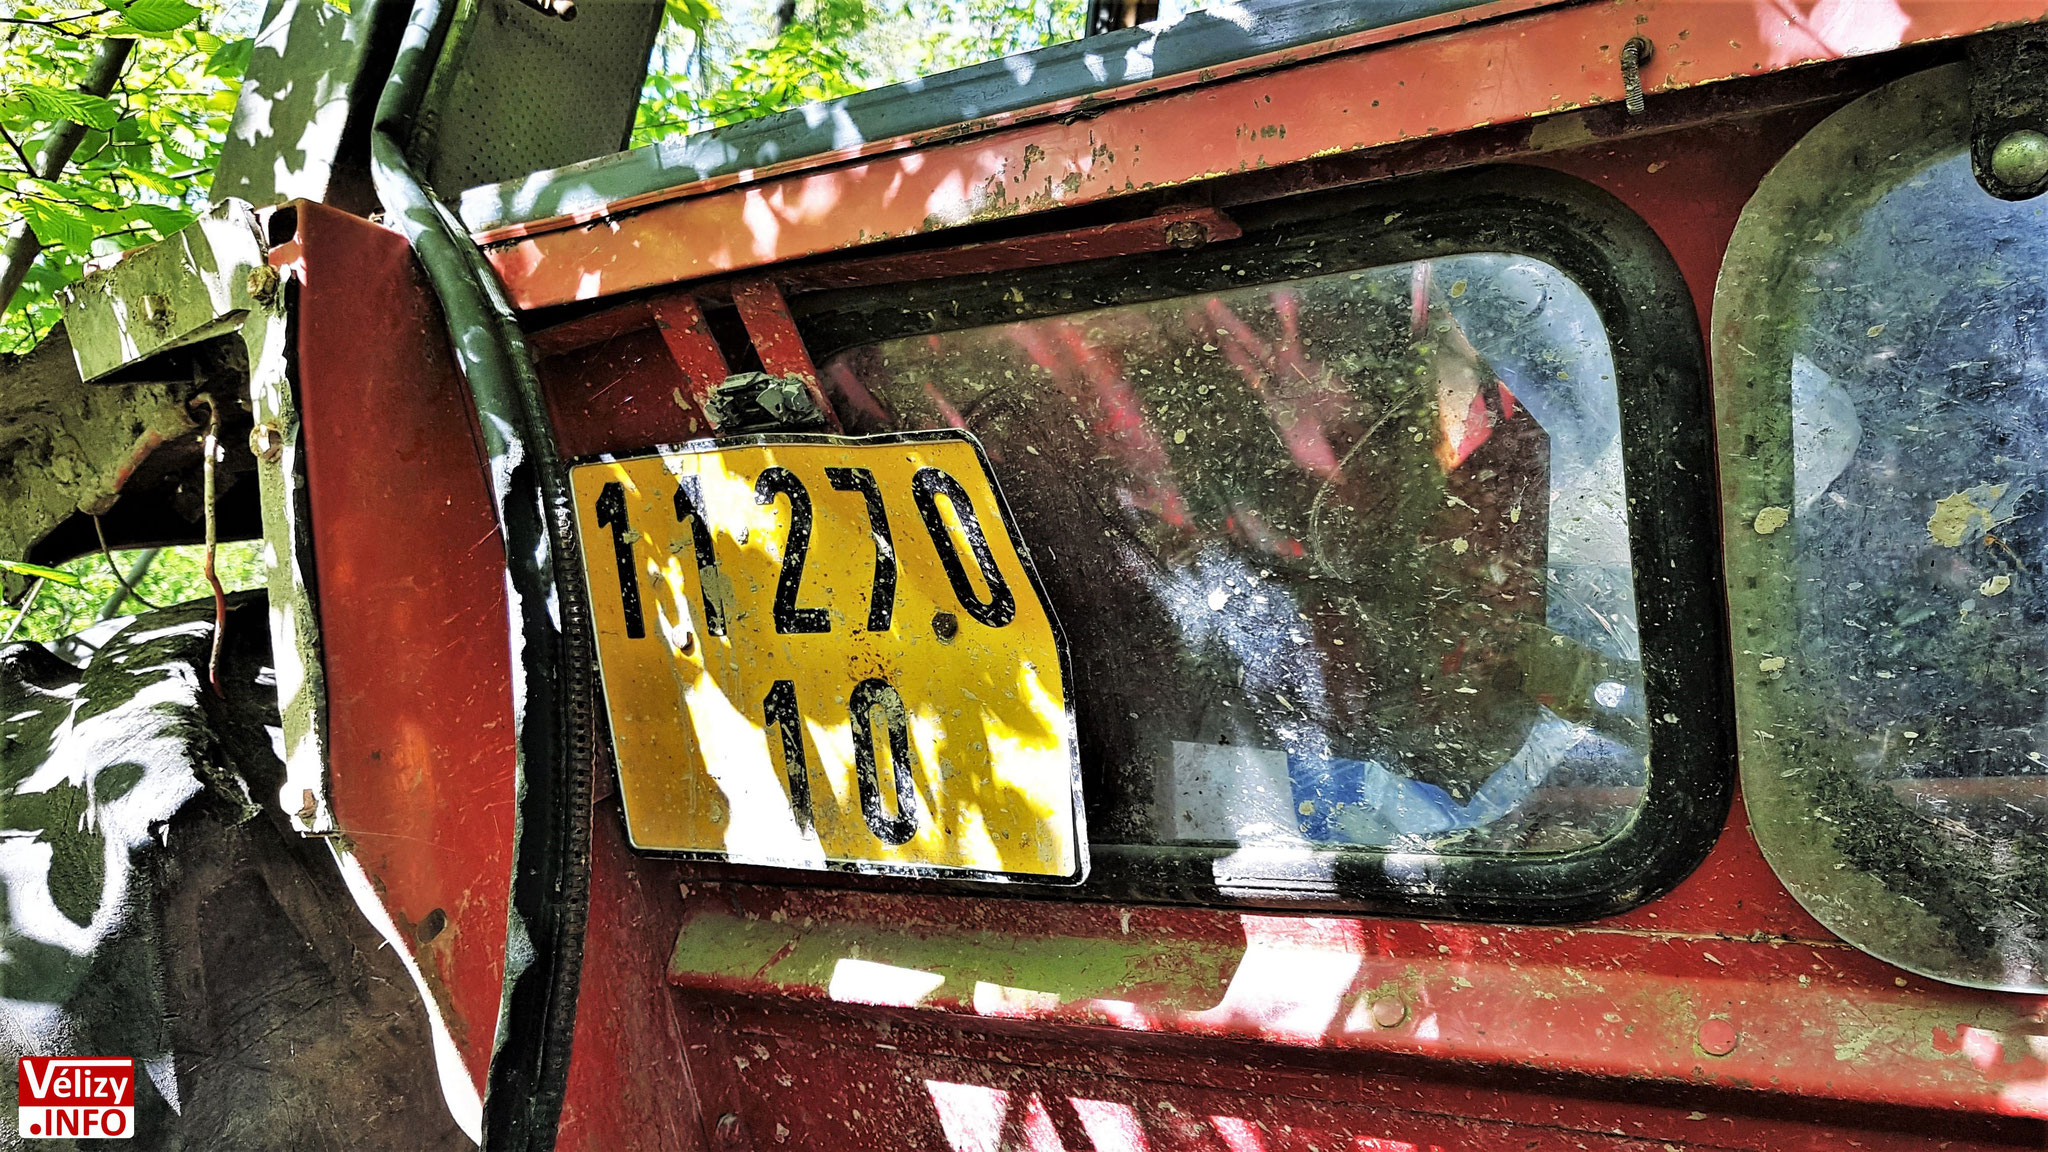 Immatriculation du tracteur.